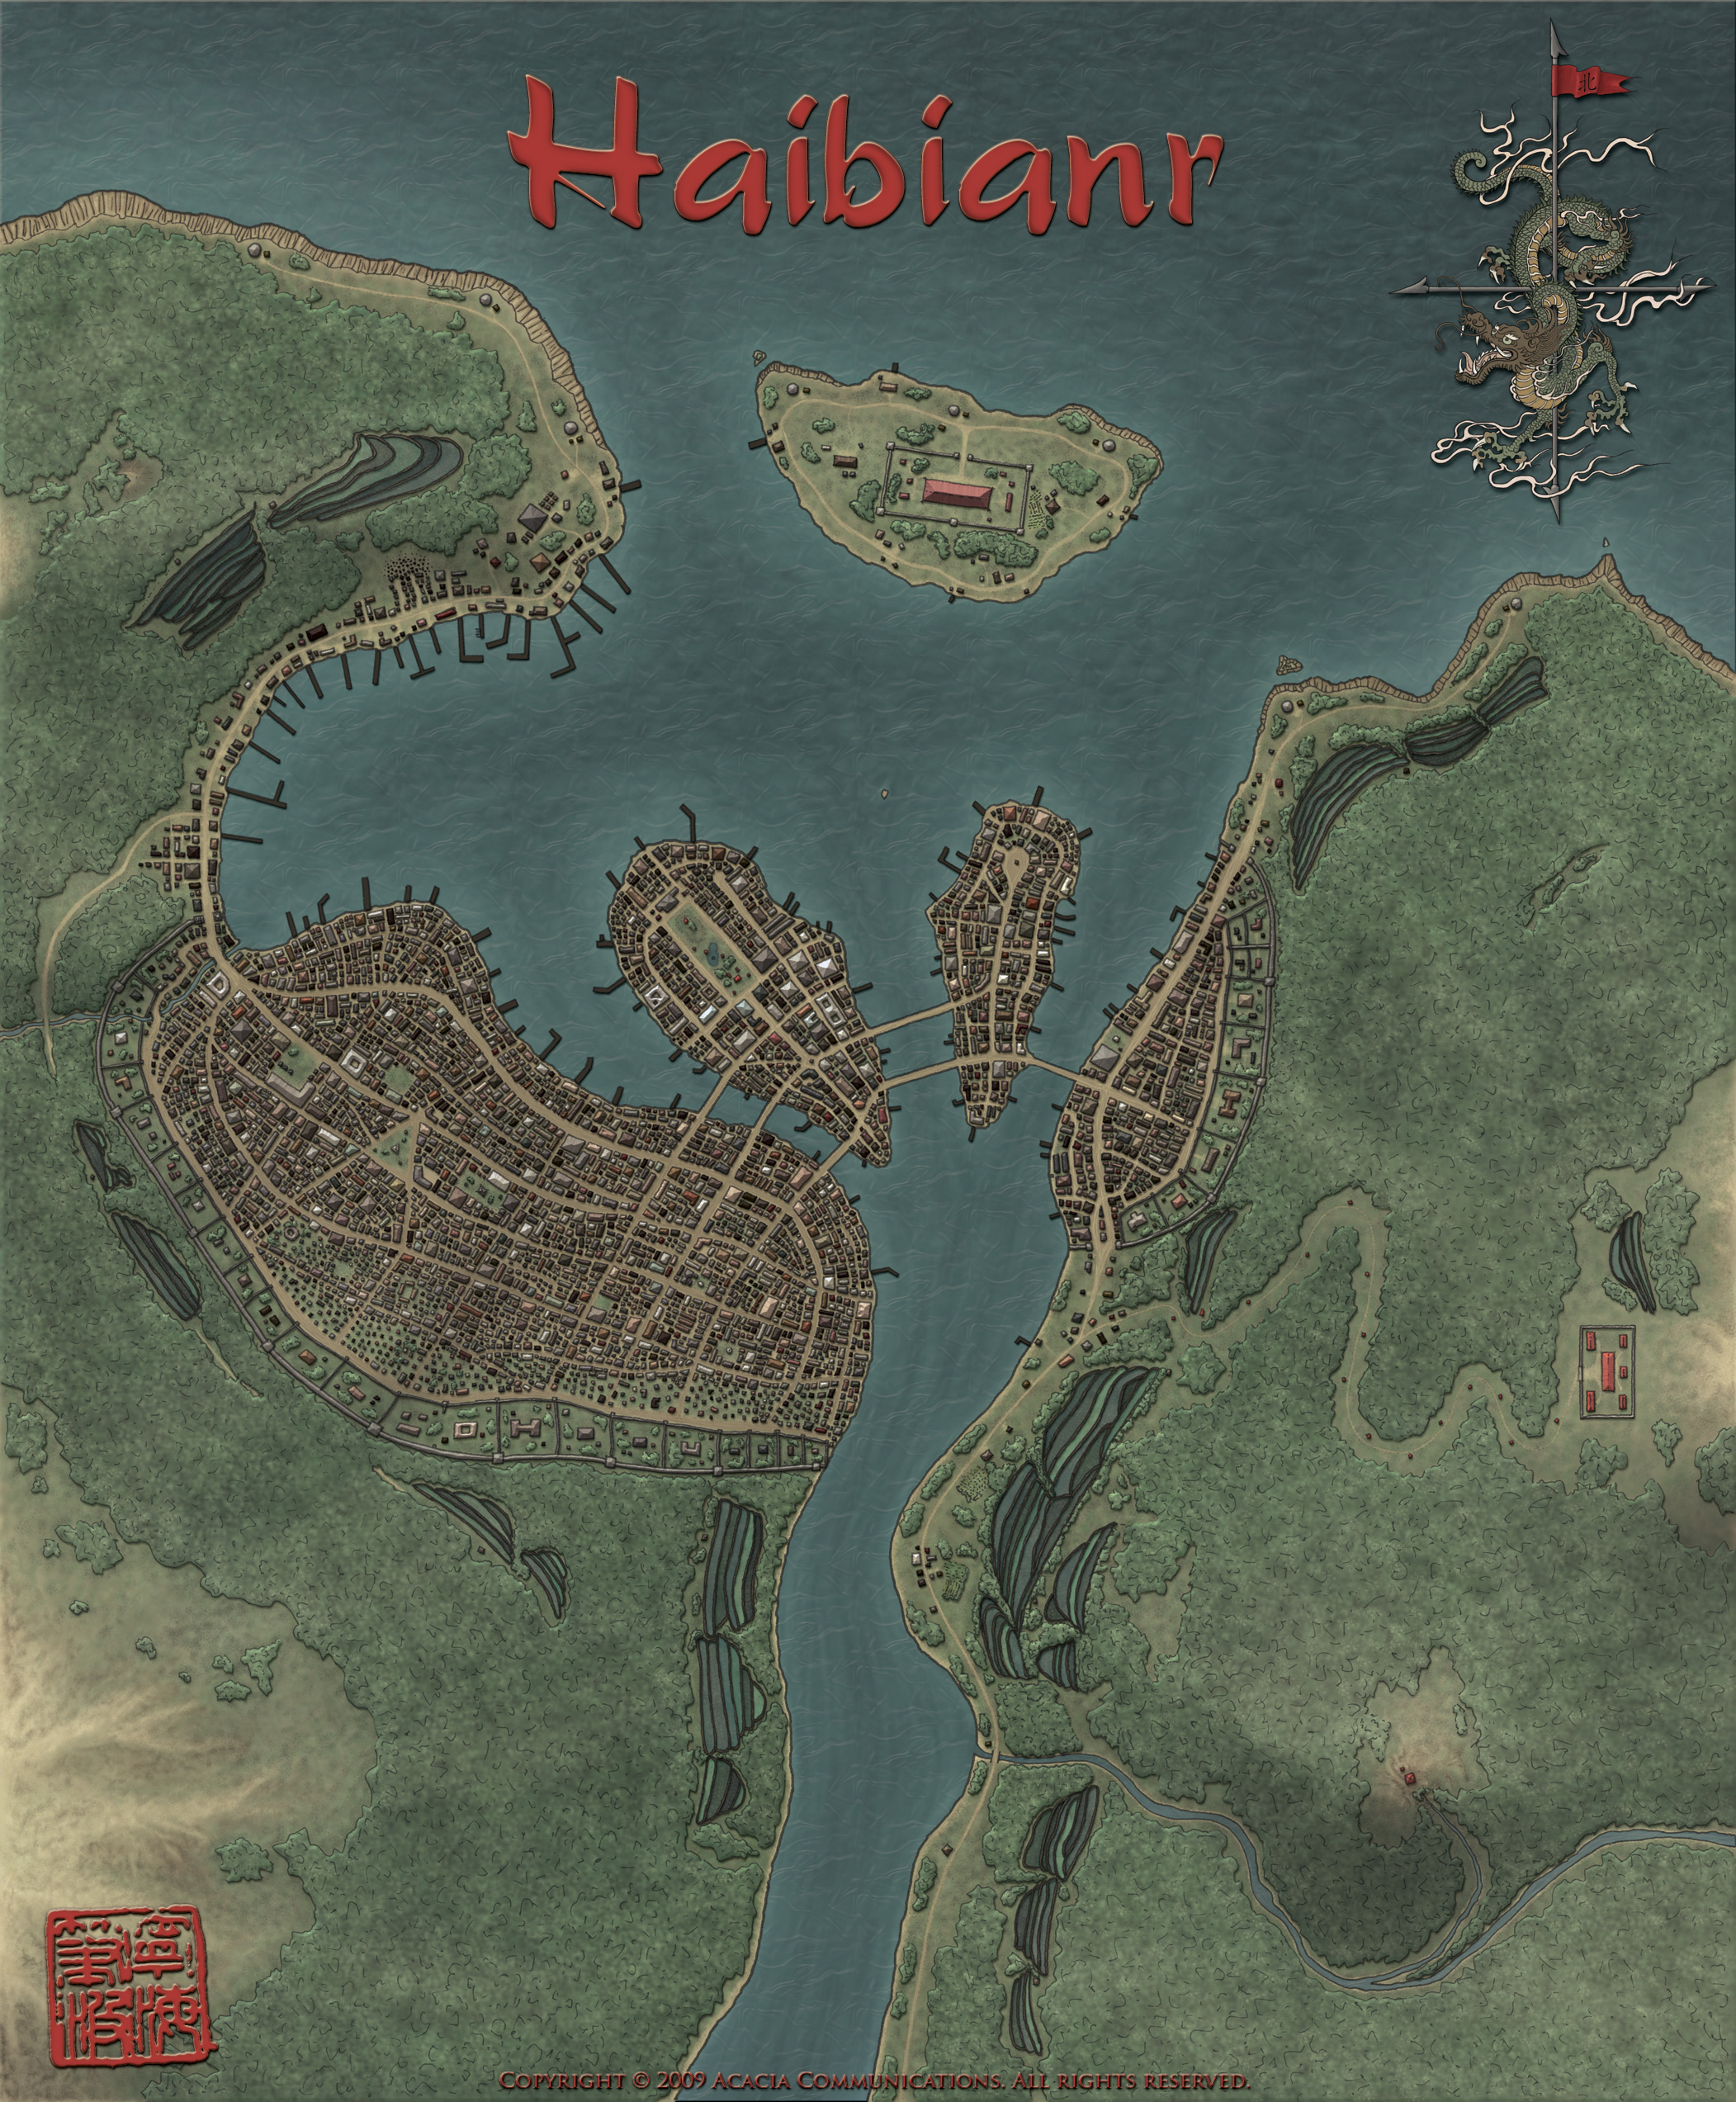 Fantasy Port City